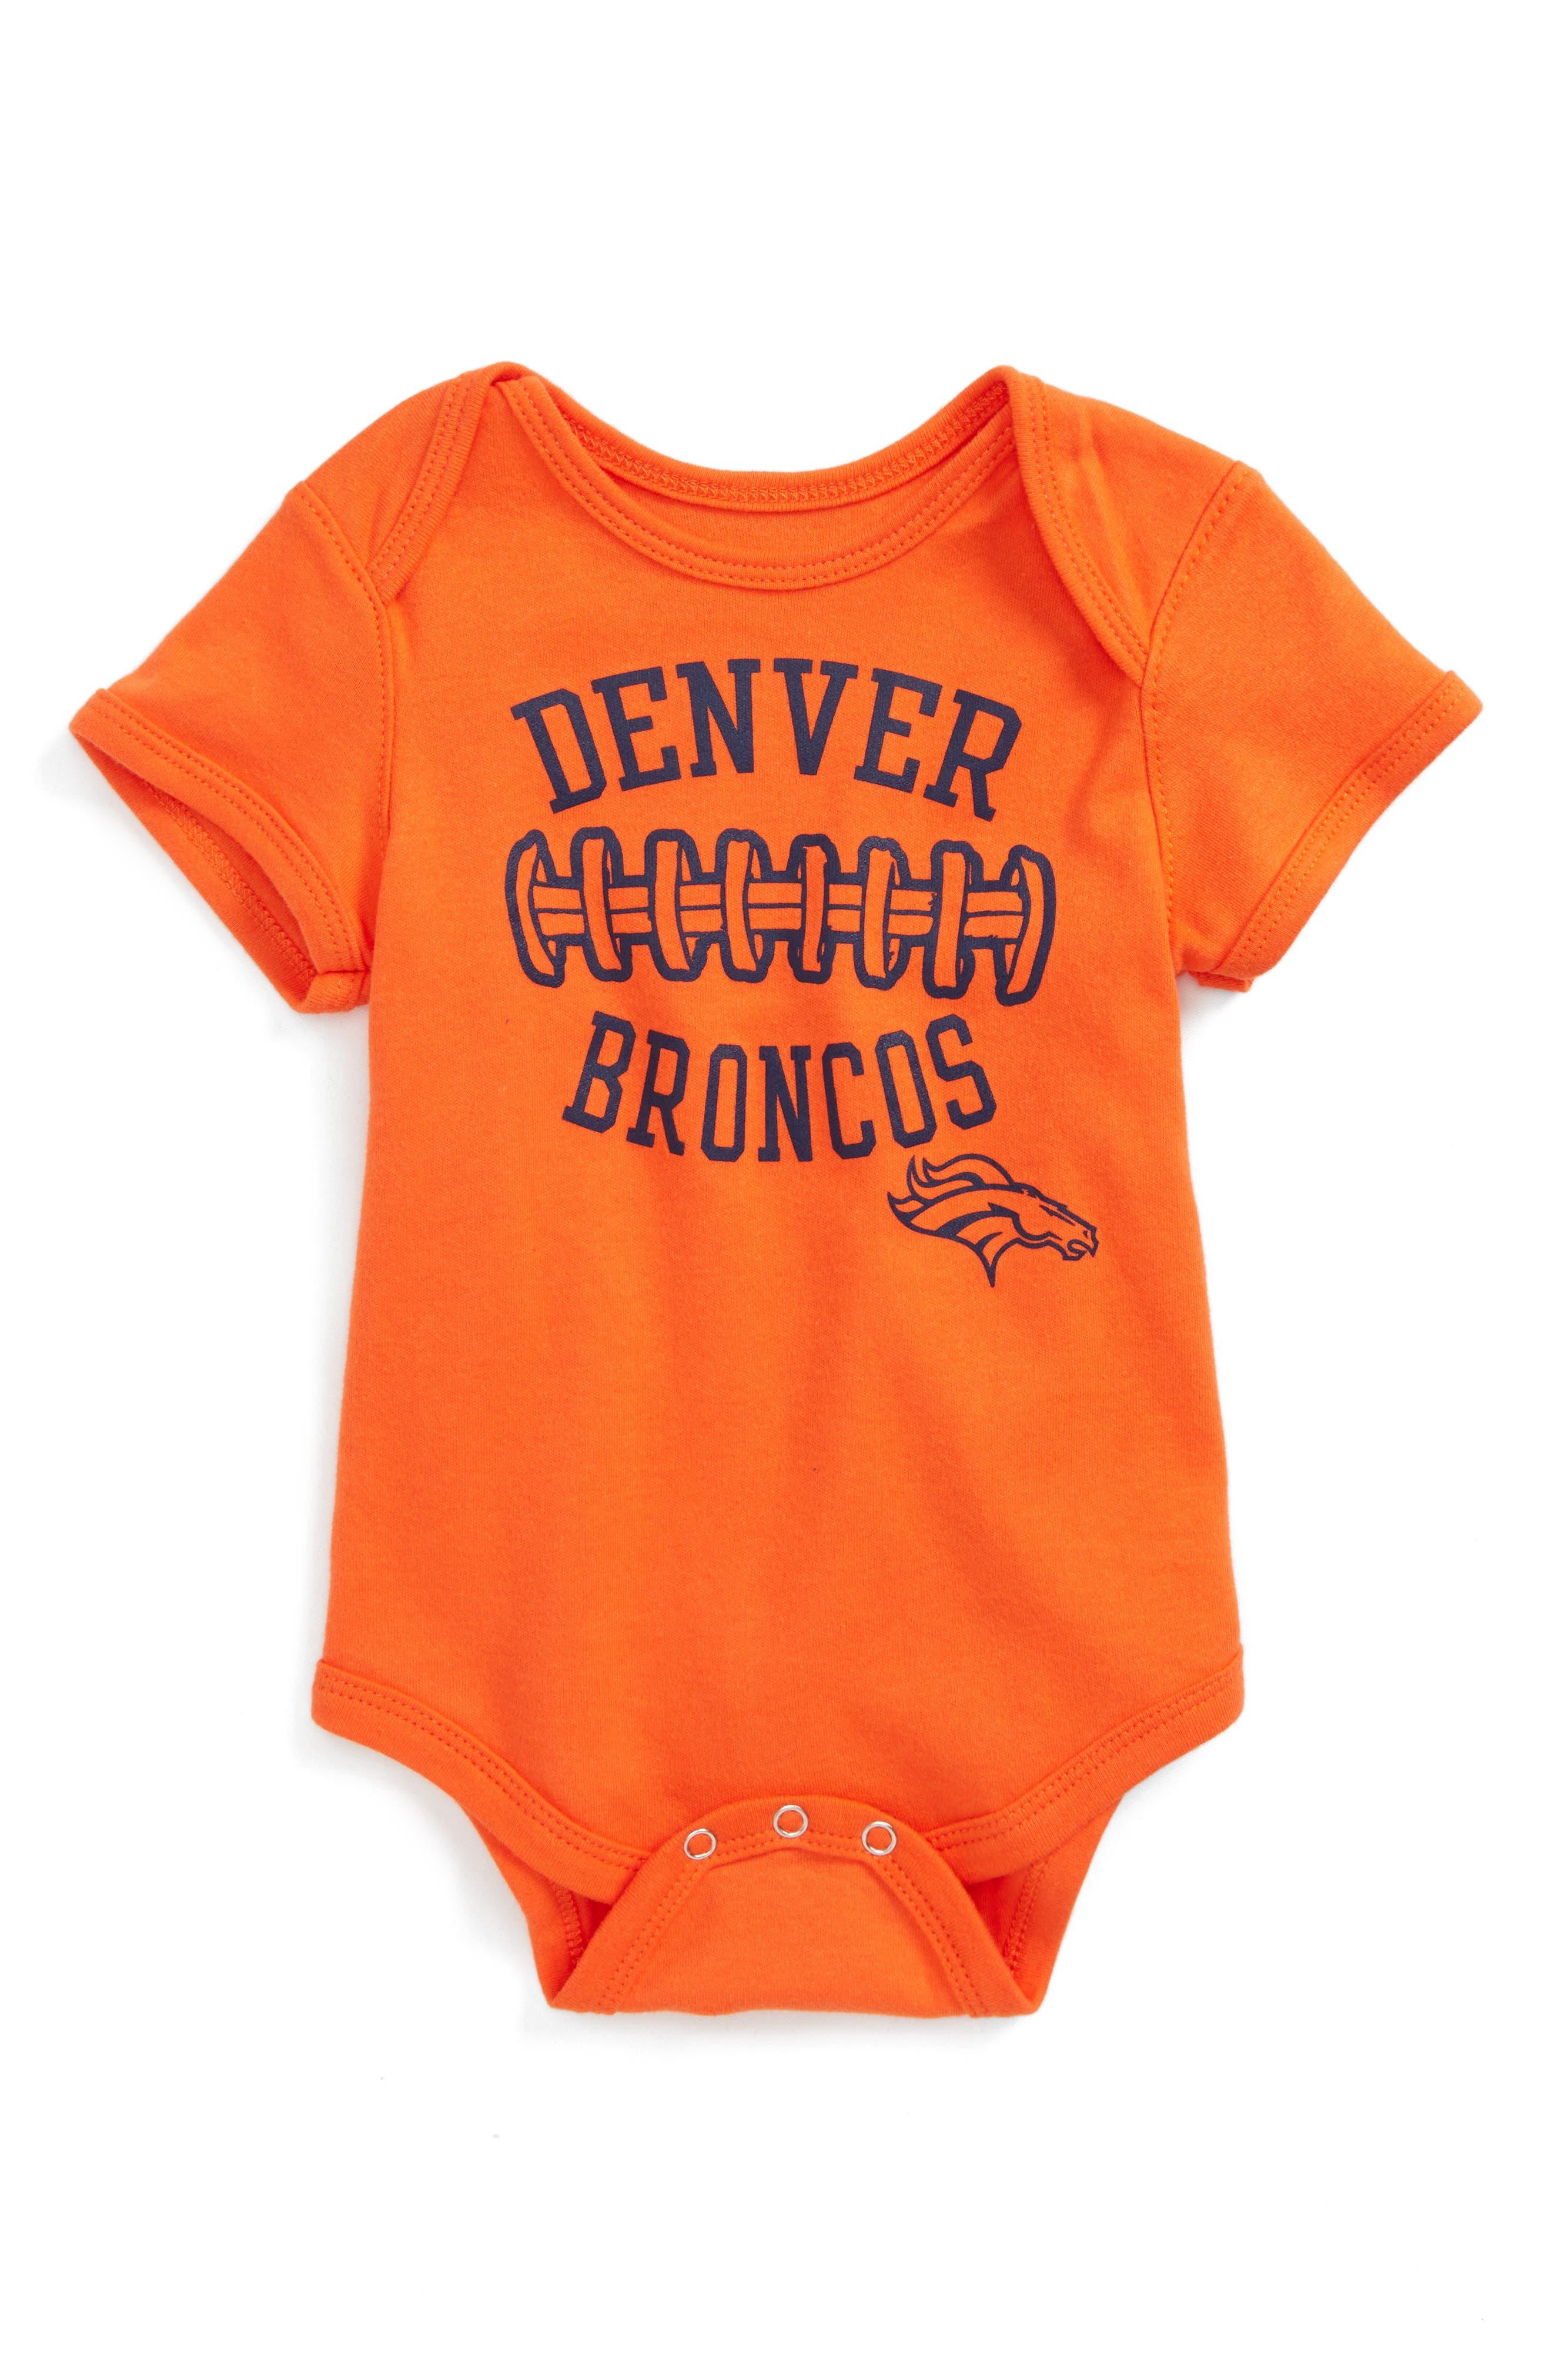 Main Image - NFL Logo Denver Broncos Fan-Atic Football Bodysuit (Baby)